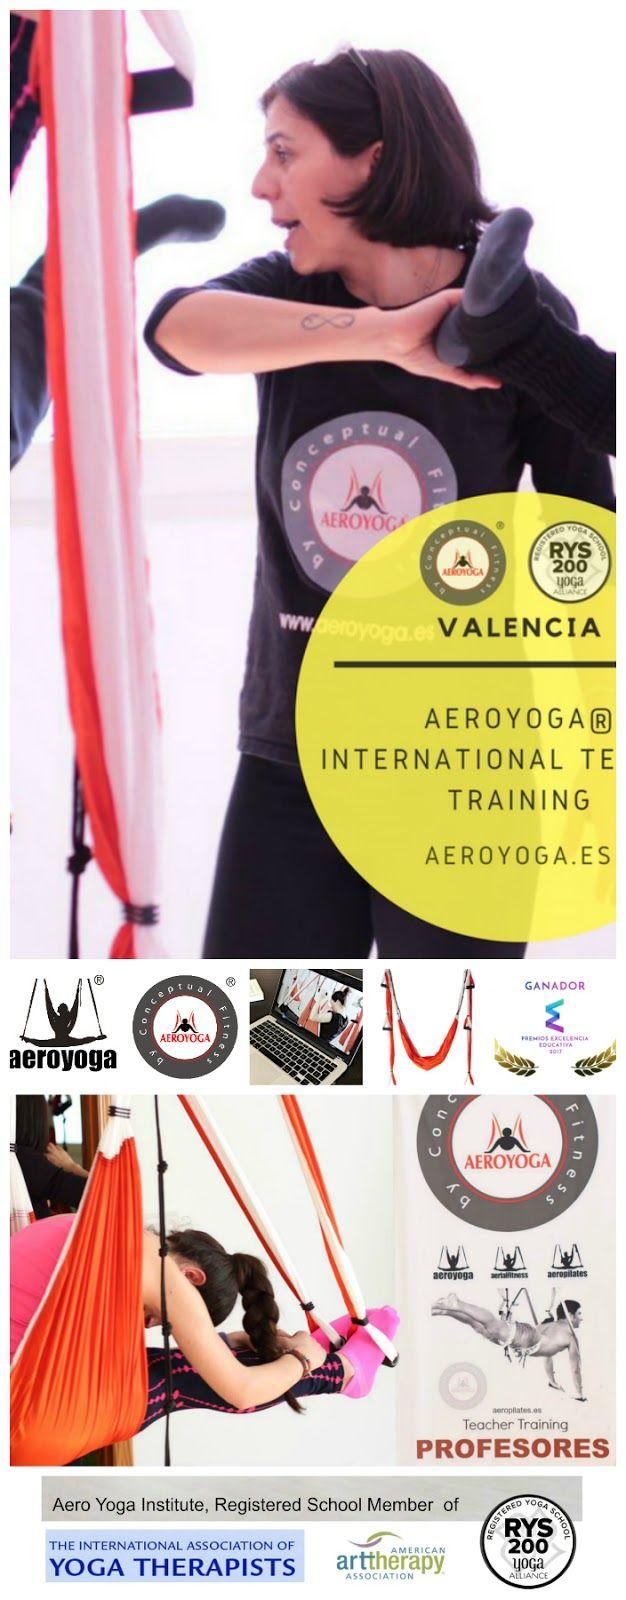 VALENCIA, ALICANTE, CASTELLON, MURCIA, JATIVA CURSO PILATES COLUMPIO ONLINE, FORMATE EN AERO PILATES A DISTANCIA FORMACION PROFESORES AEROYOGA® Y AEROPILATES® OFICIAL VALENCIA - UN METODO DE RAFAEL MARTINEZ, INTRODUCTOR DEL YOGA AEREO Y EL PILATES AEREO EN EUROPA Y AMERICA LATINA #aeroyoga #aeropilates #weloveflying #airyoga #airpilates #aerialyoga #yoga #pilates #aero #acro #aerial #acrobatic #silks #telas #aerea #teachertraining #yogaaereo #yogaaerea #fly #flying #airyoga #cursos #clases…